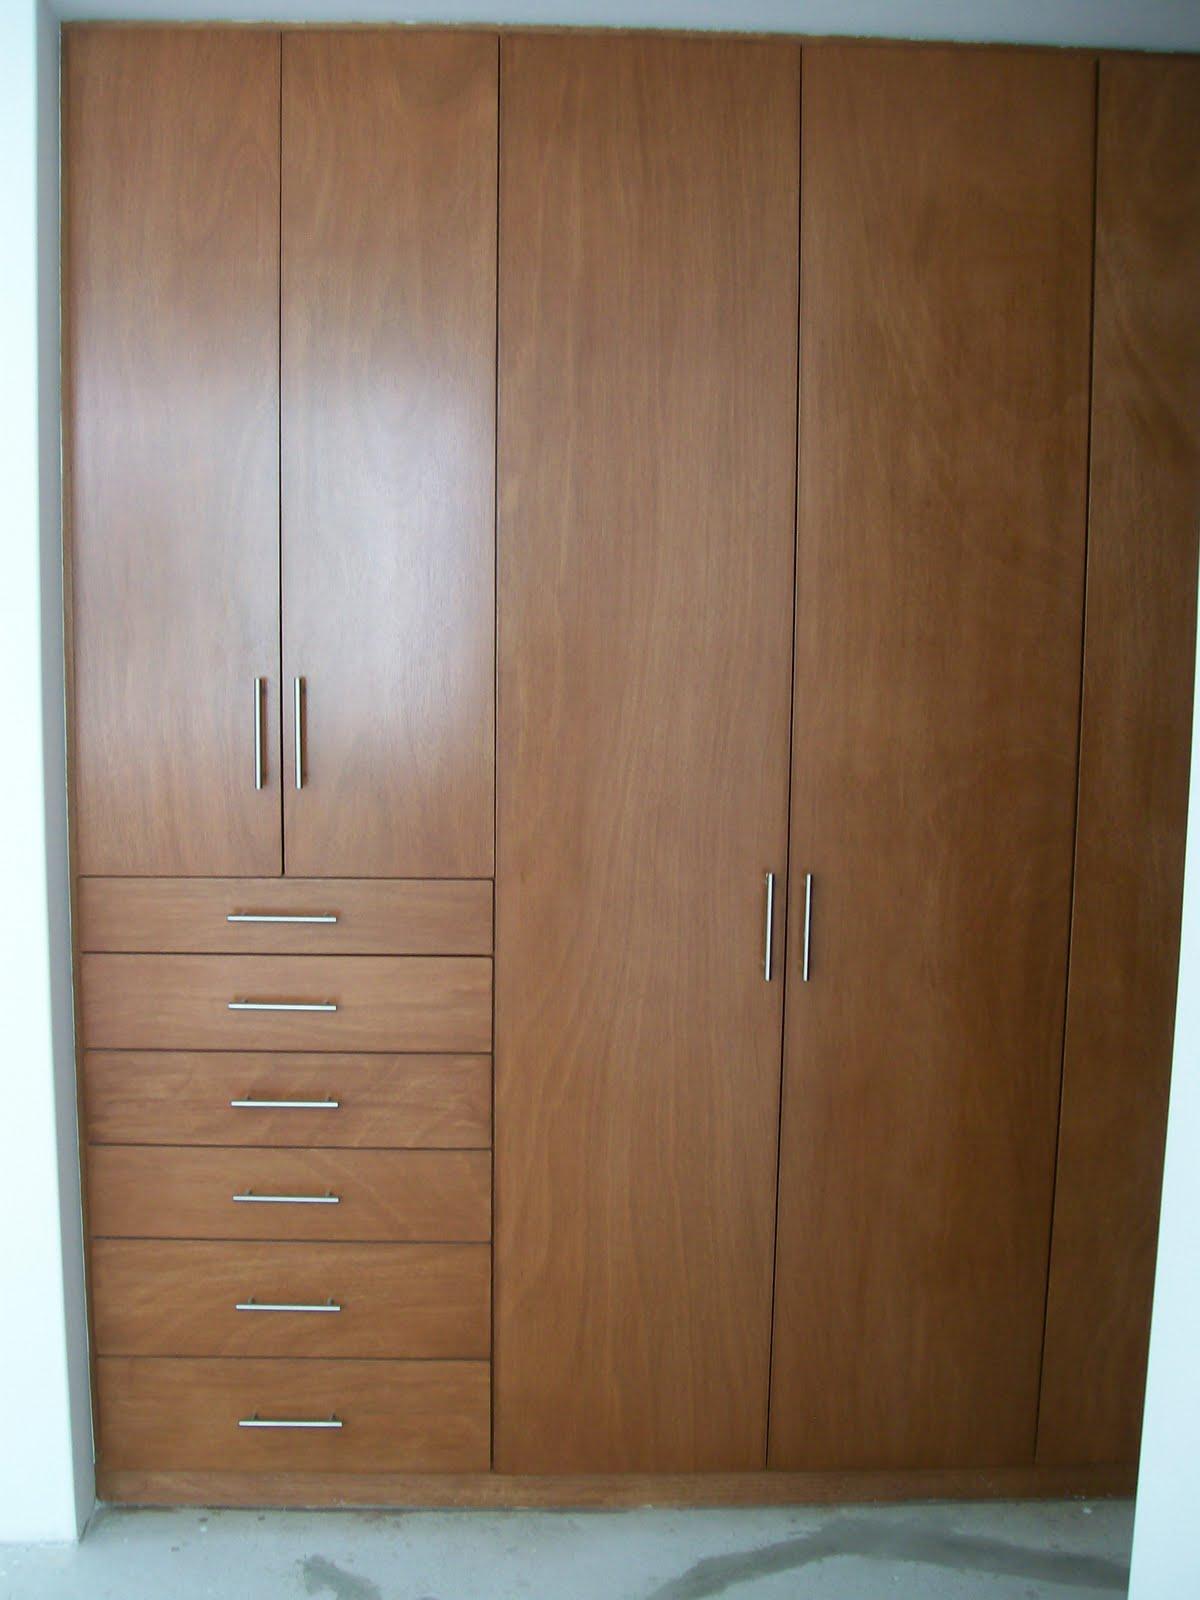 Dise o de closet imagui for Diseno zapateras para closet